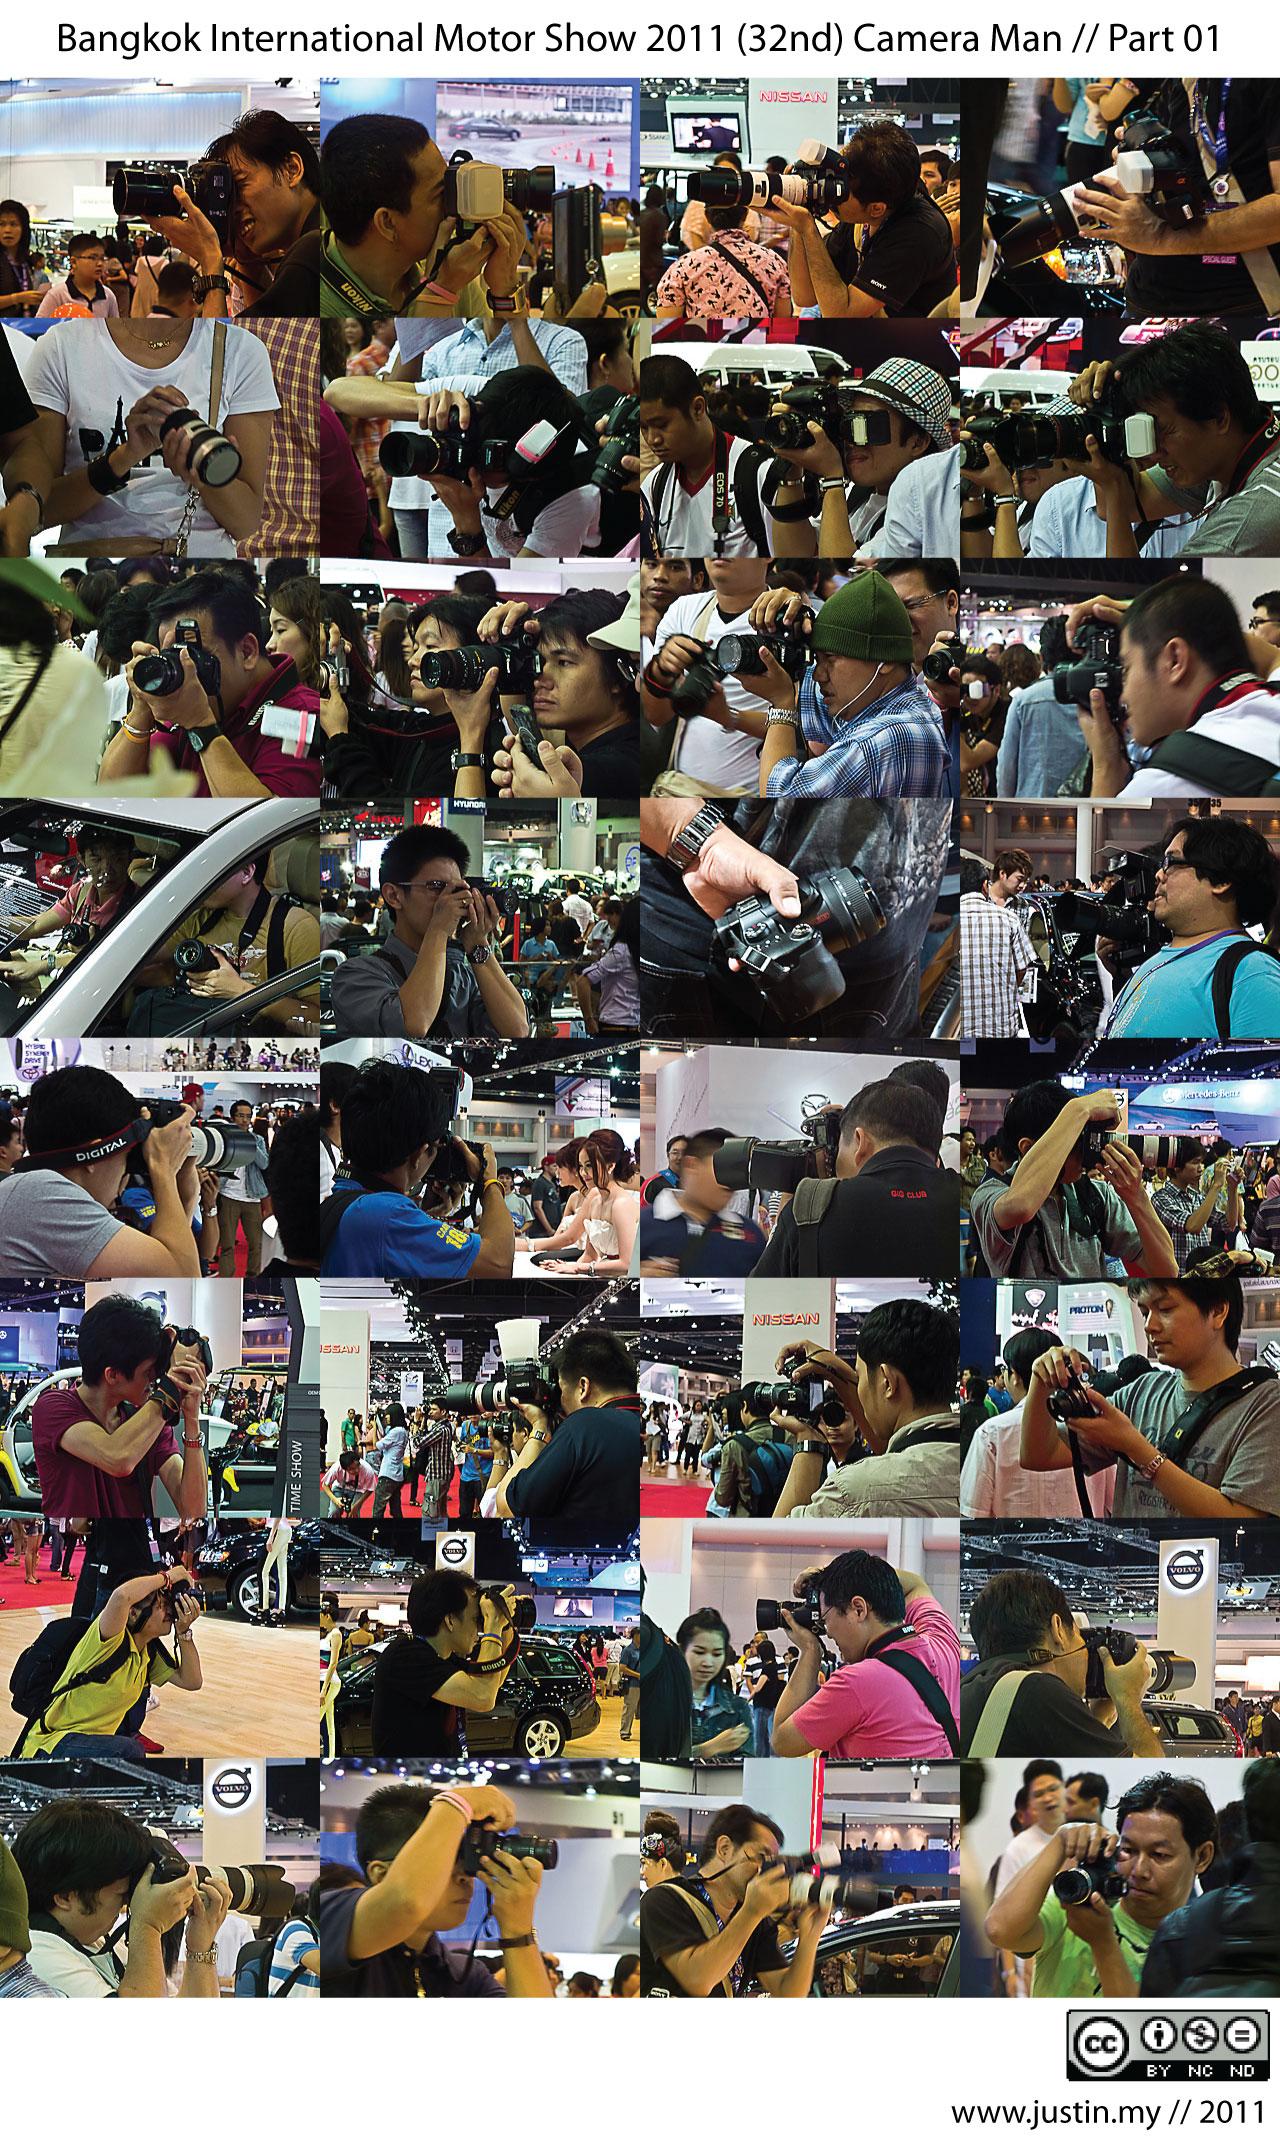 Bangkok-International-Motor-Show-2011-Camera-Man-01